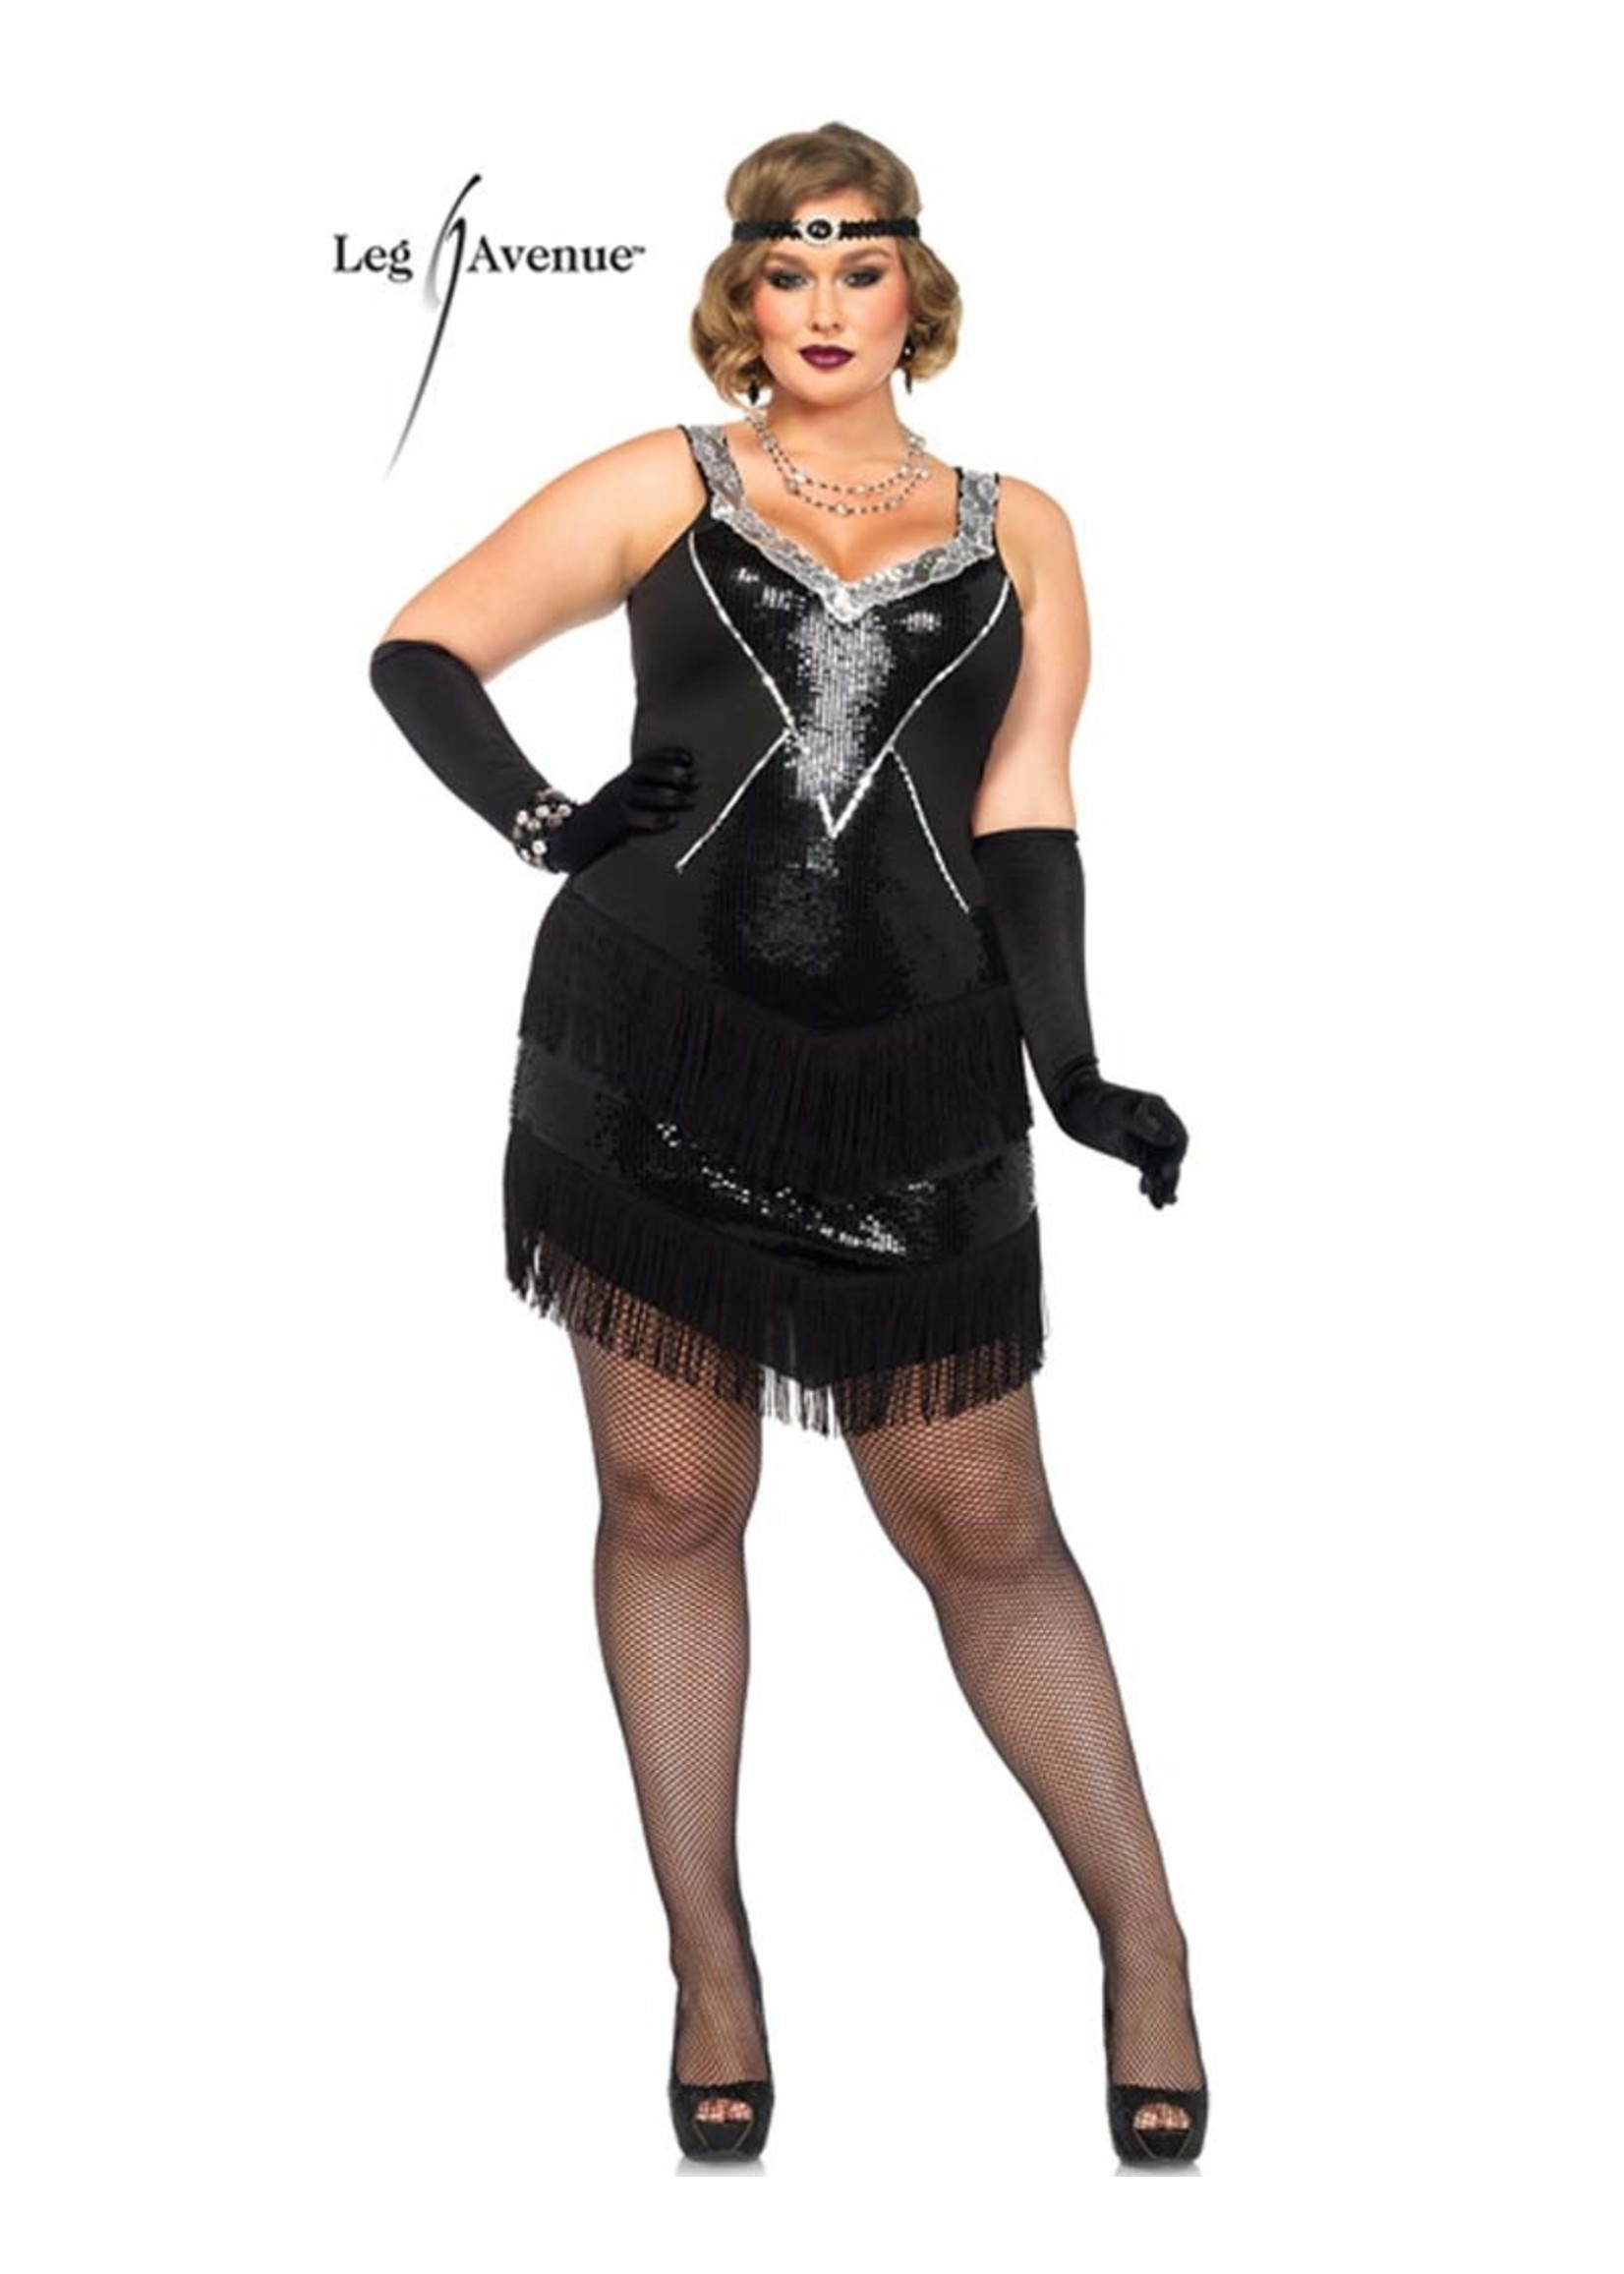 LEG AVENUE Glamour Flapper - Women's Plus